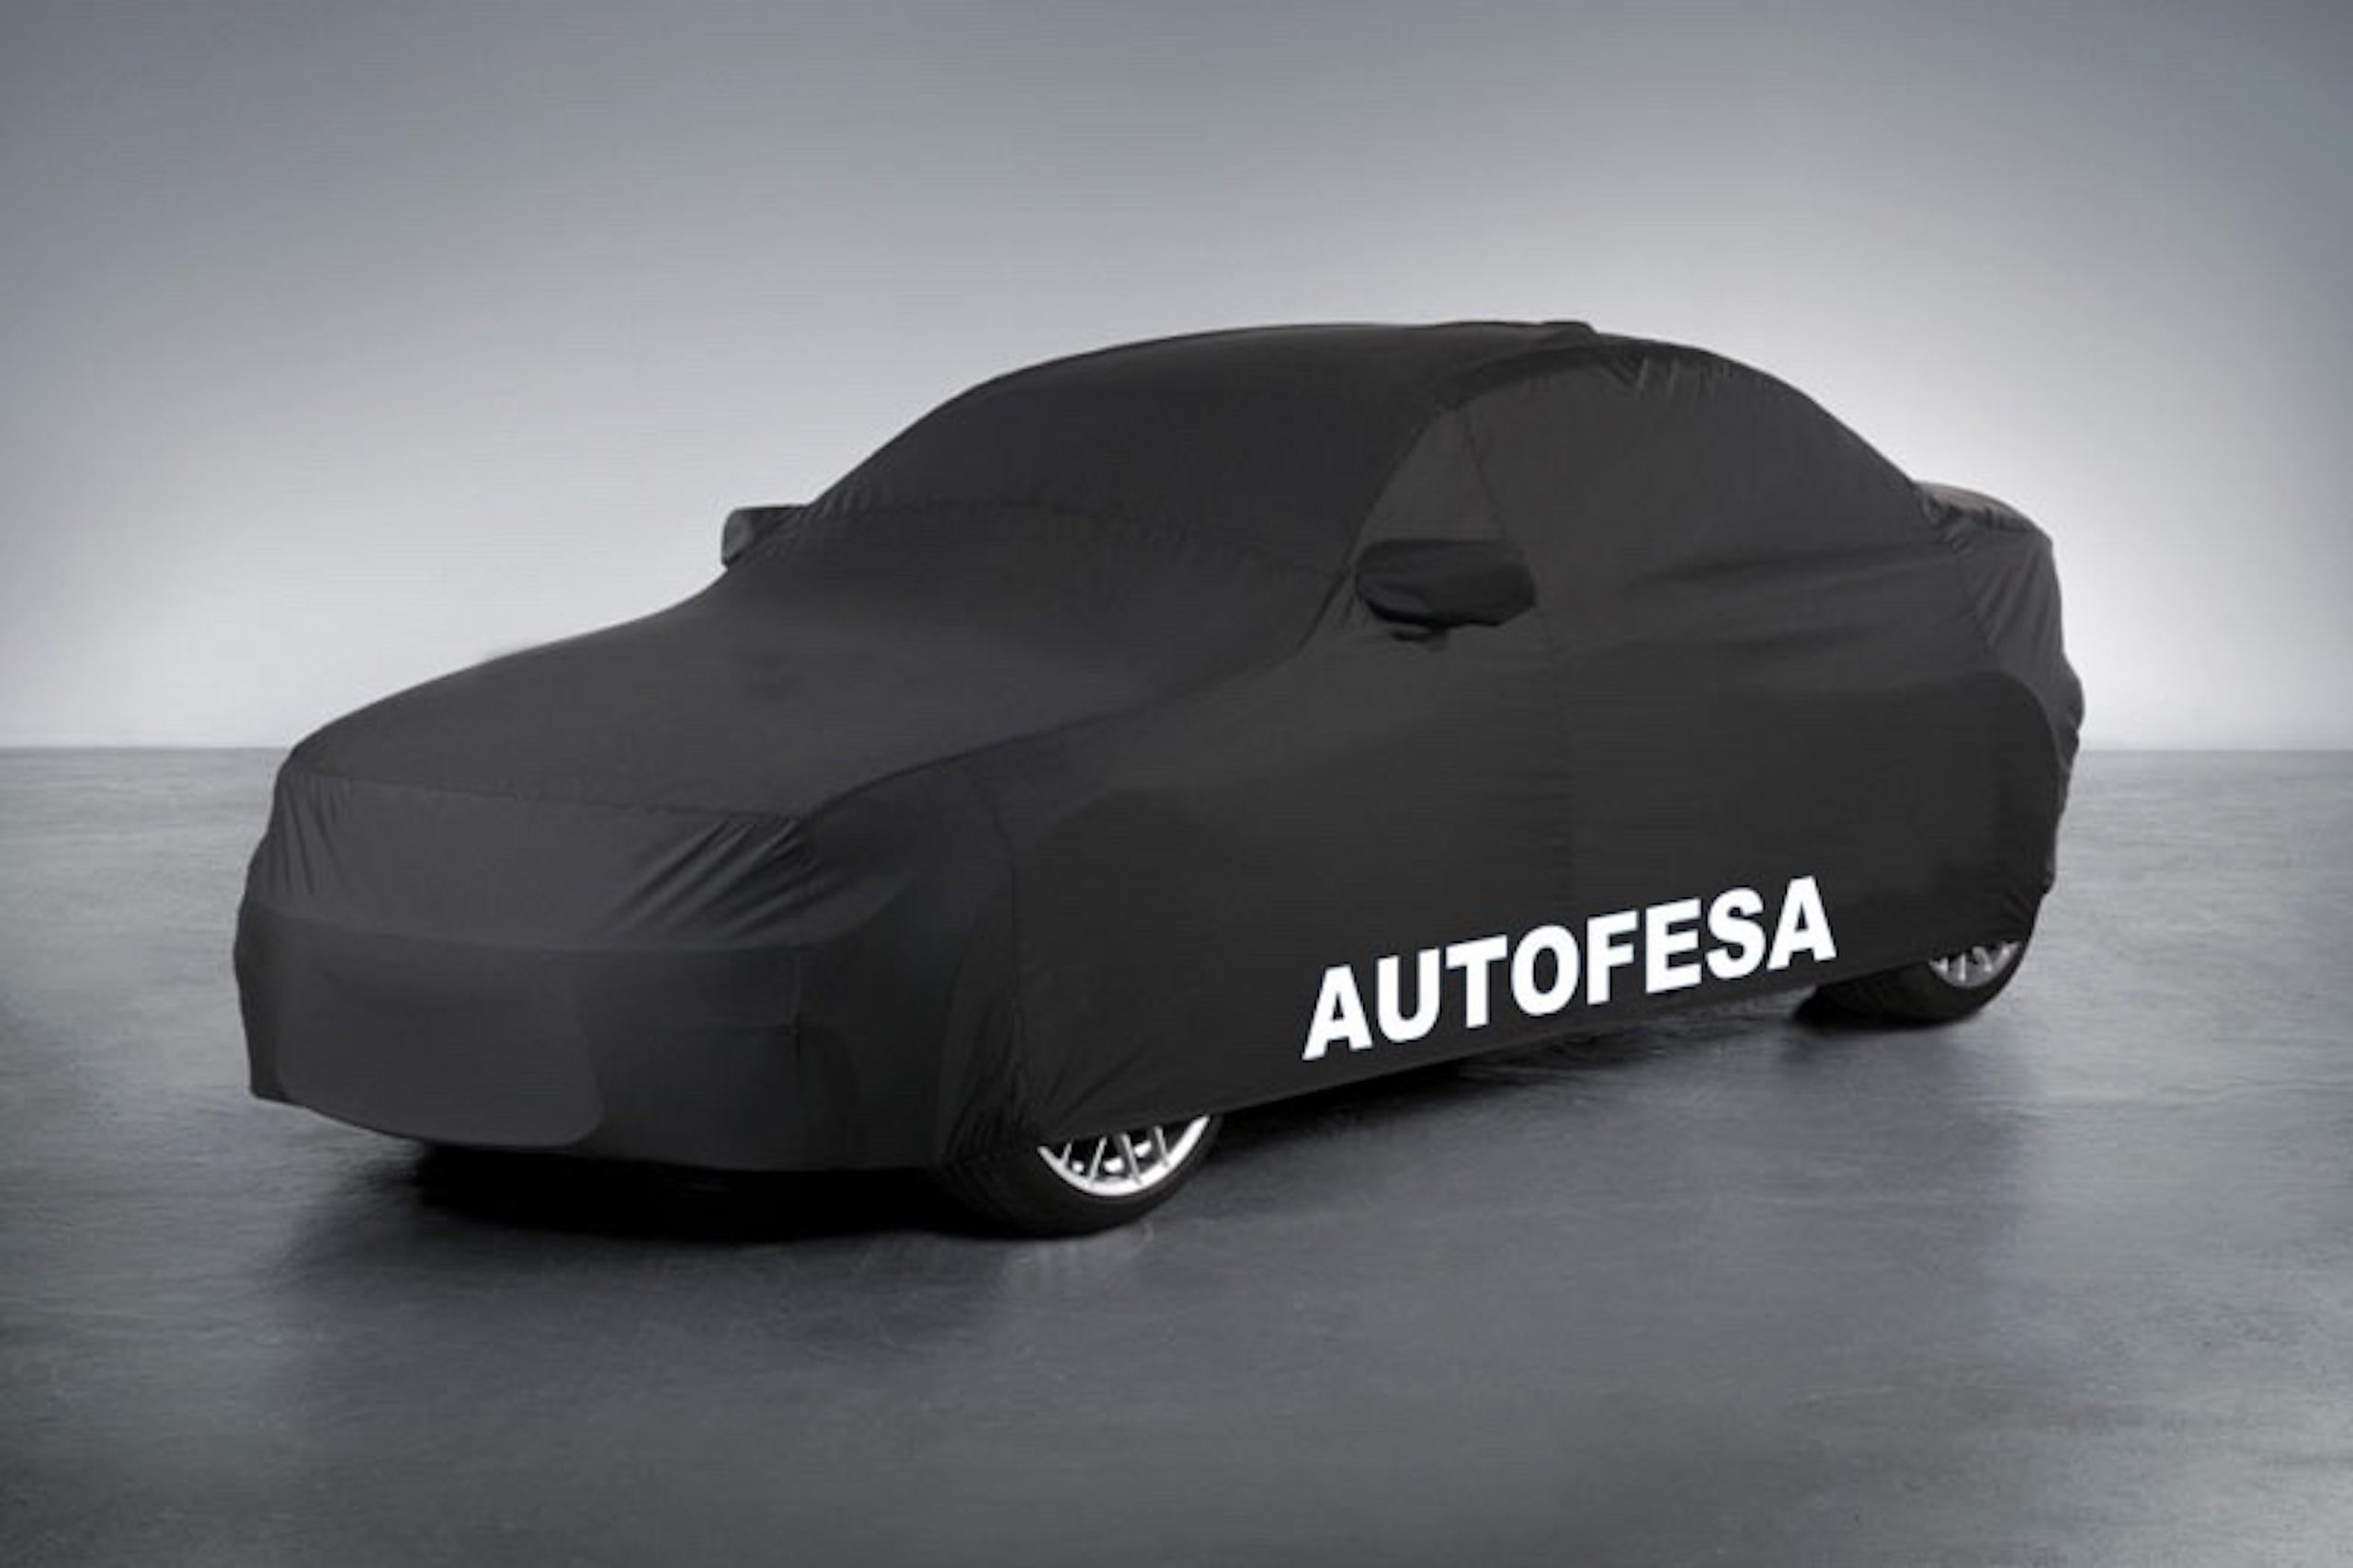 Ford Mondeo 2.0 TDCi 150cv Trend 5p Powershift Auto S/S - Foto 15